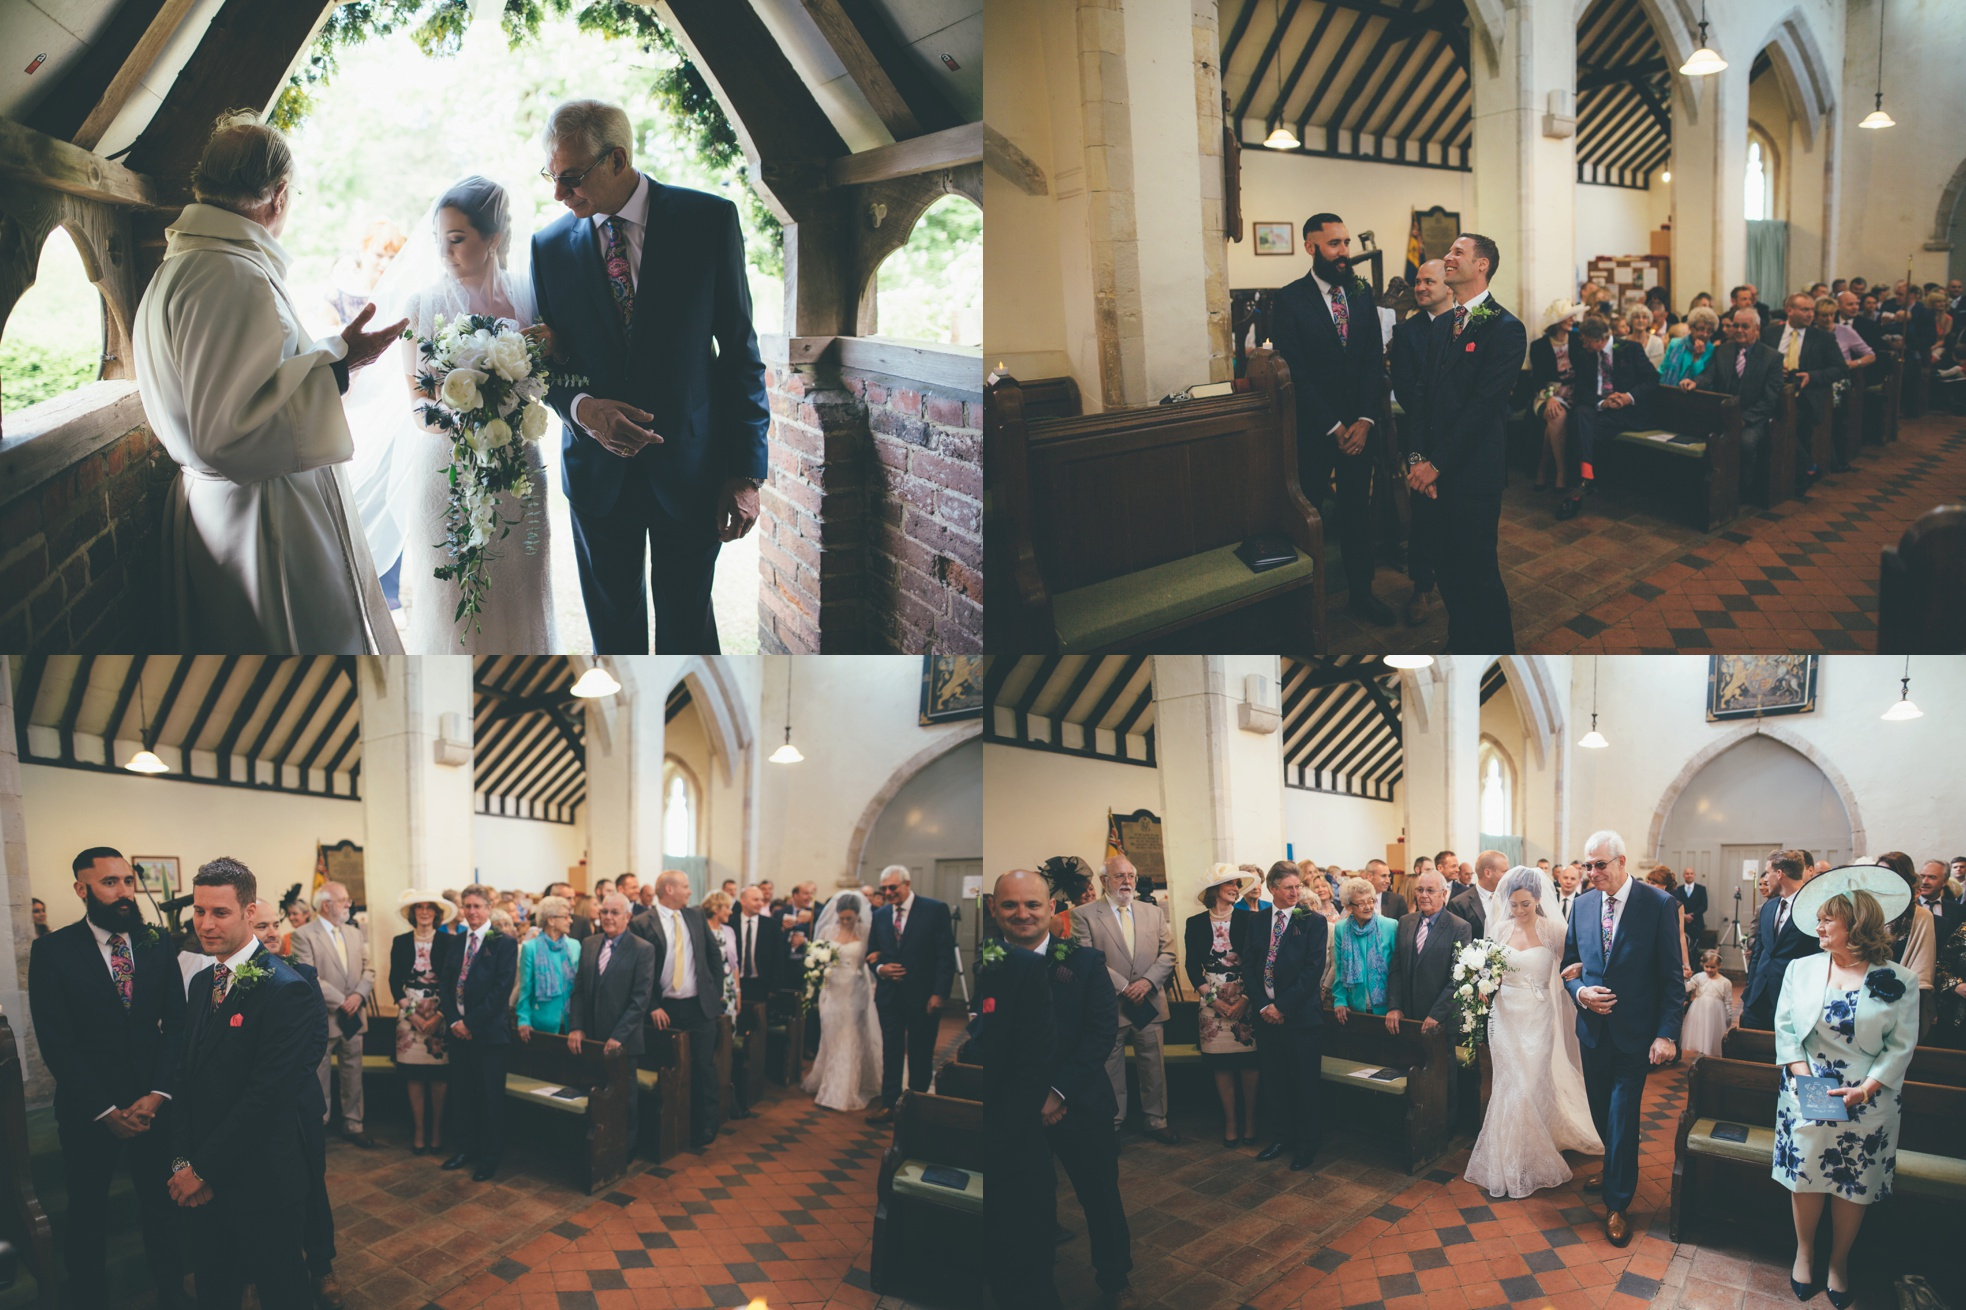 ClaireKieranwedding_PrestonCourtCanterbury_0010.jpg